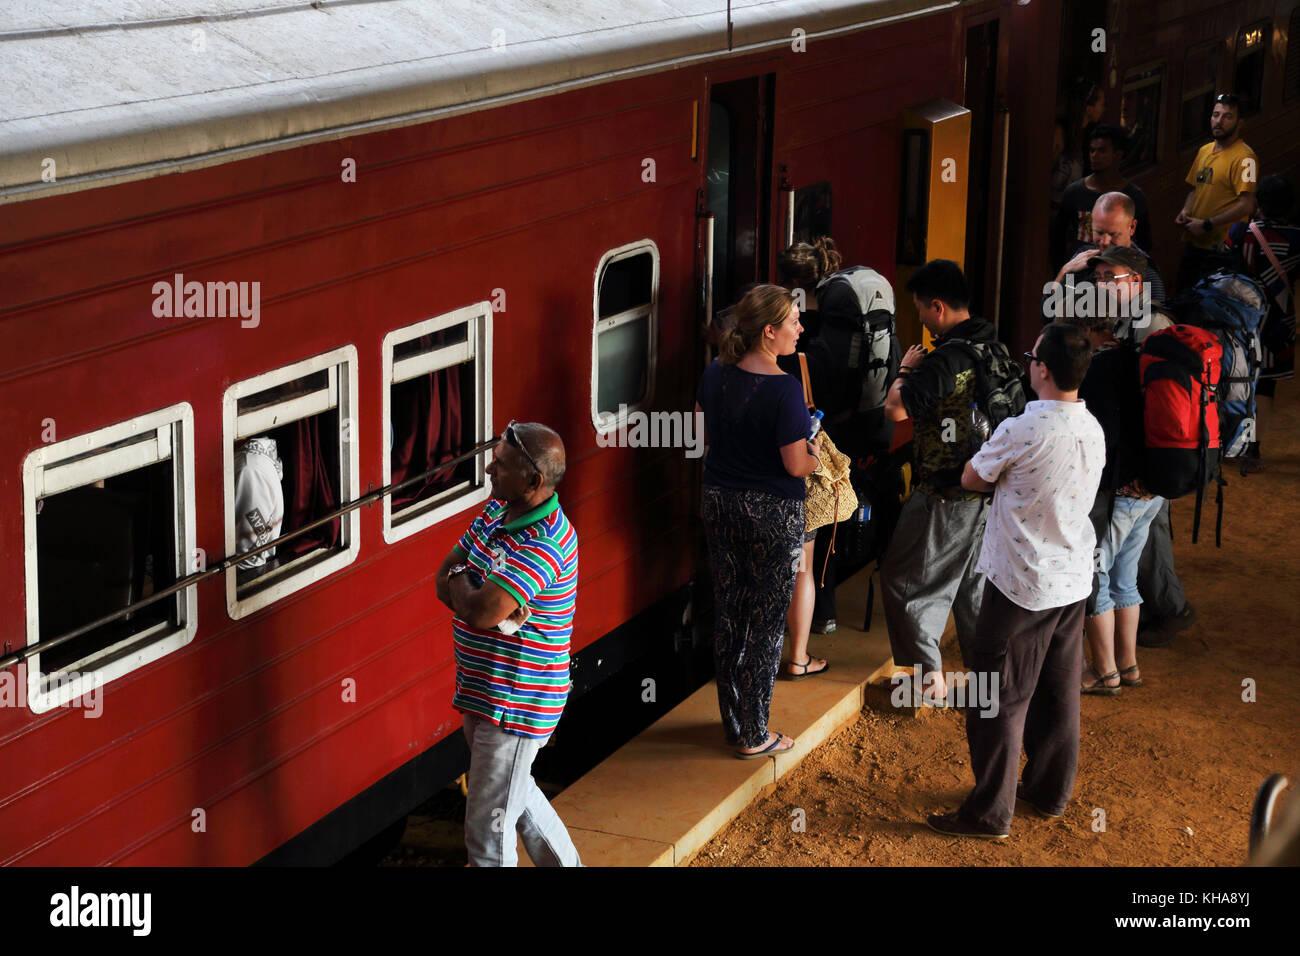 Peradeniya Junction Station Kandy Central Province Sri Lanka Passengers Boarding train Stock Photo